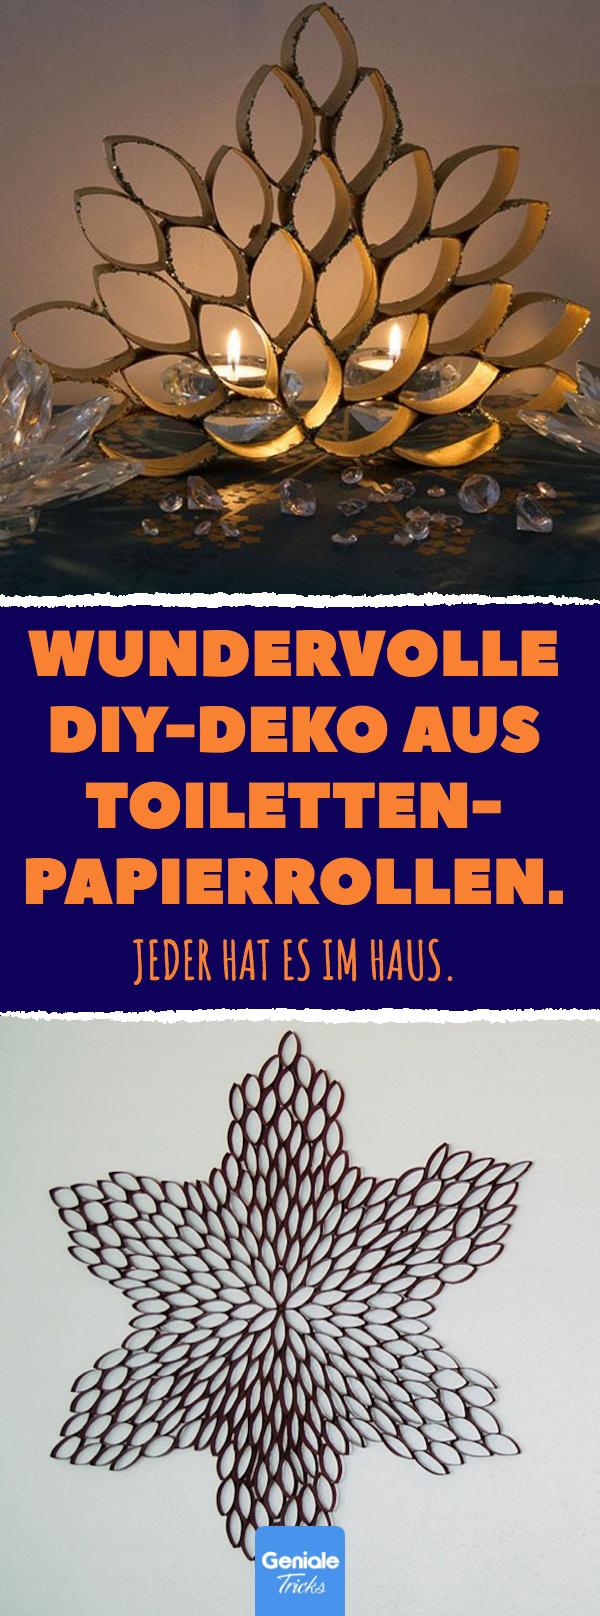 Schöne Wanddeko aus Klopapierrollen. #upcycling #diy #klopapier #toilettenpapier #klorolle #recycling #reuse #deko #wohnung #wand #toiletpaperrolldecor